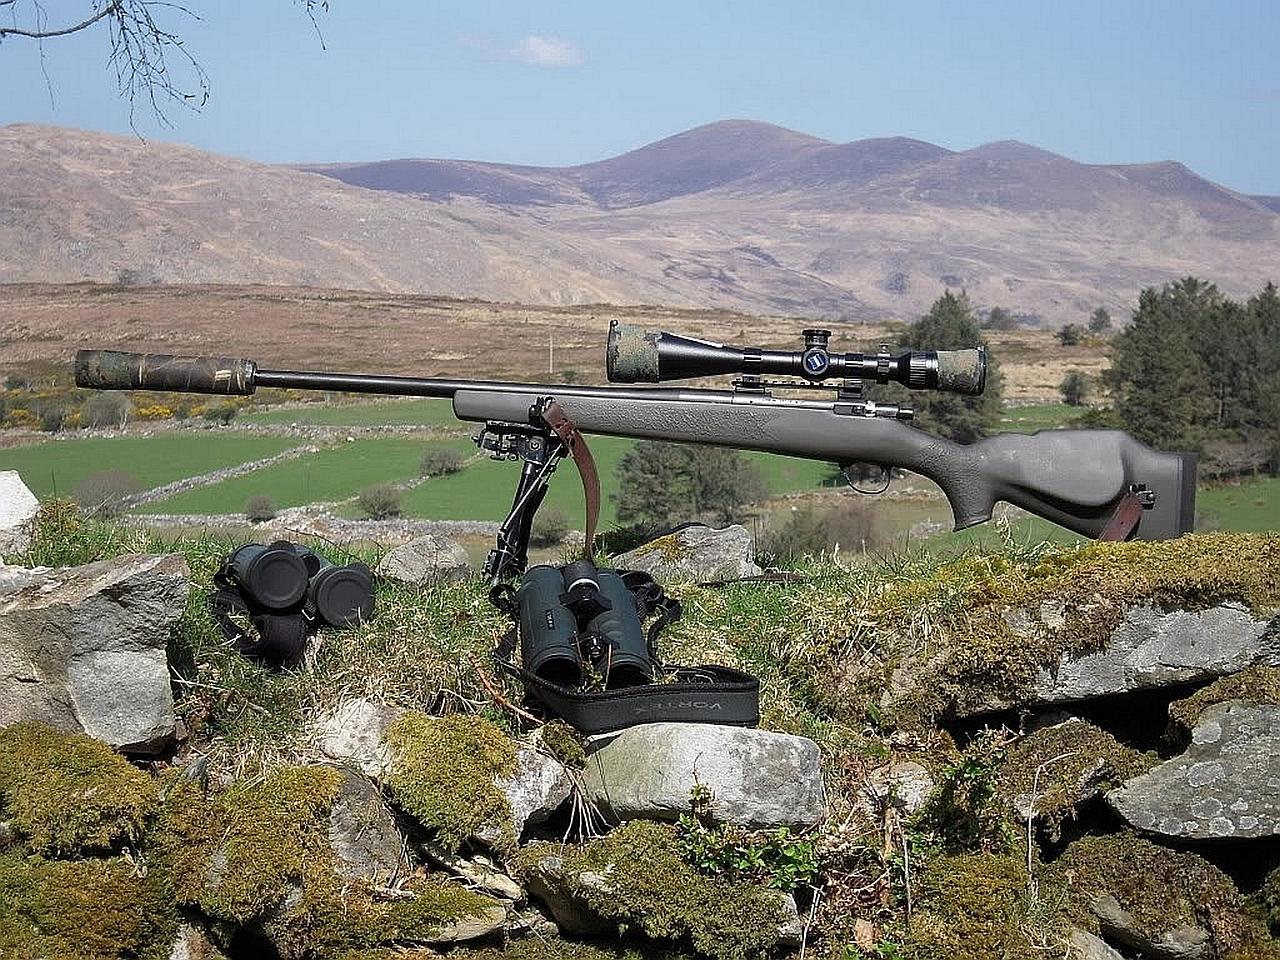 Sniper Rifle Computer Wallpapers Desktop Backgrounds 1280x960 ID 1280x960